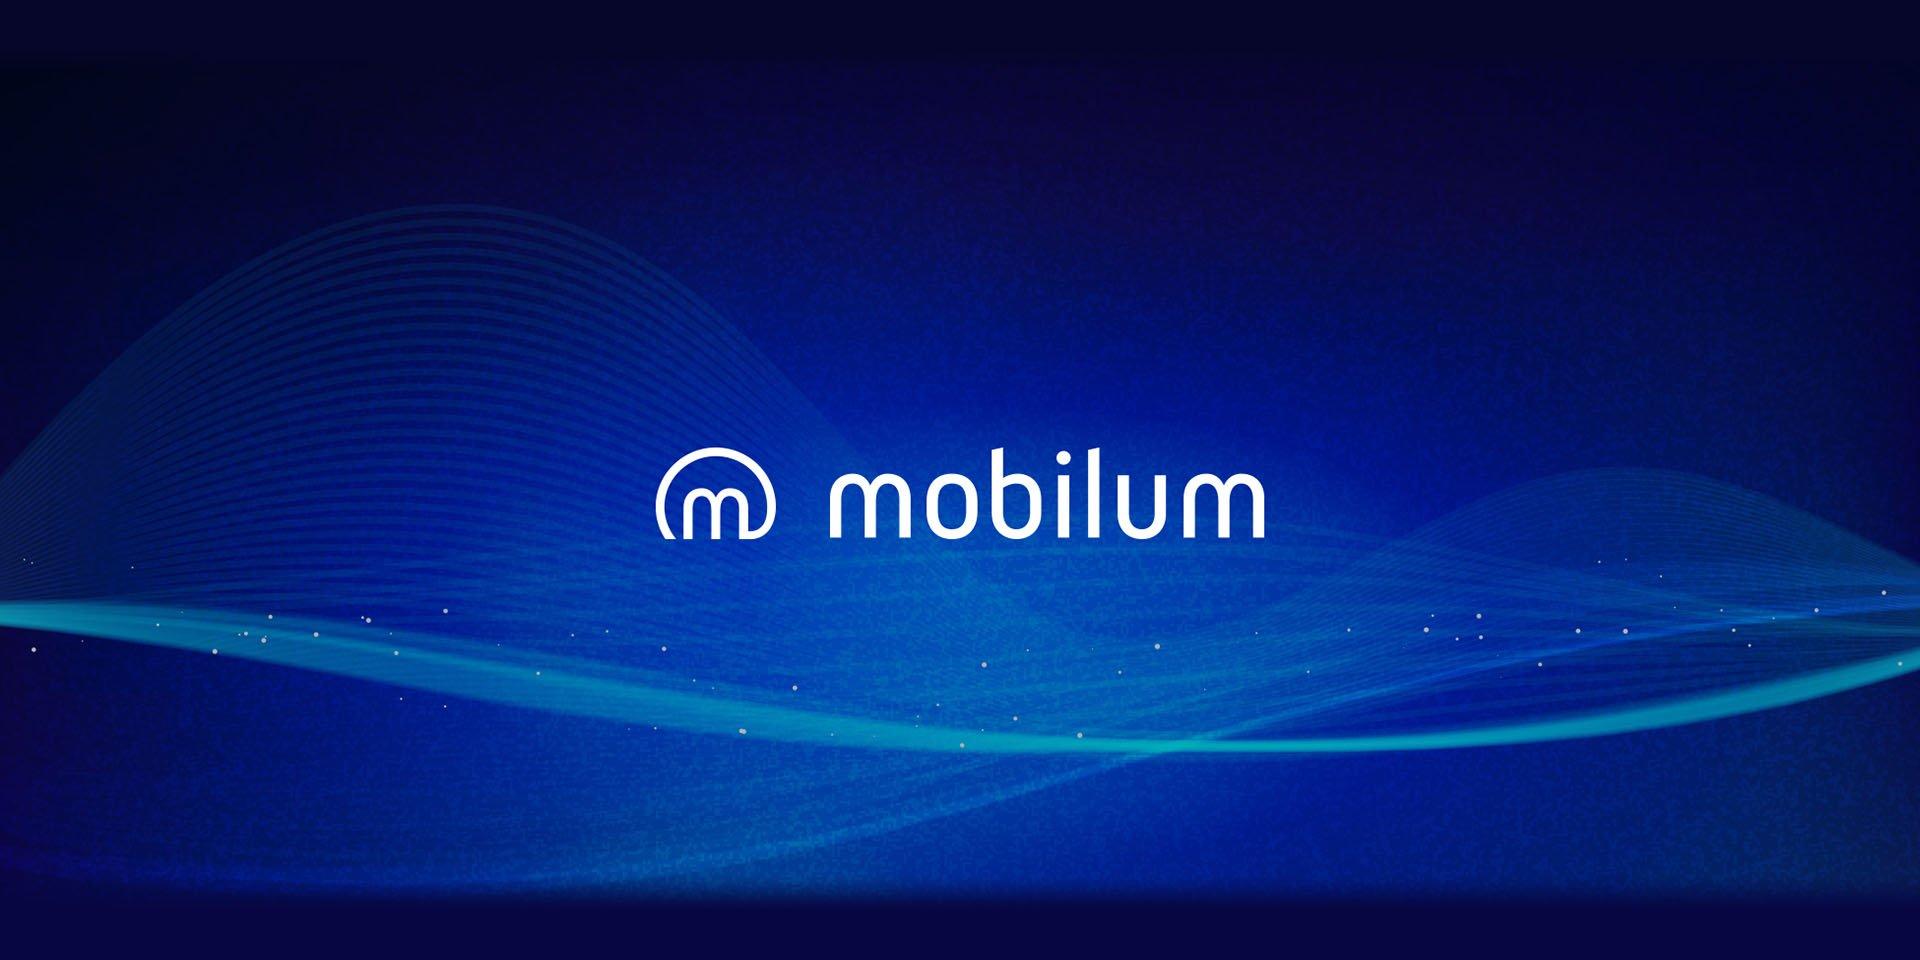 Mobilum Announces Roman Pogorzelski and Ishmael Malik as Its Latest Advisors